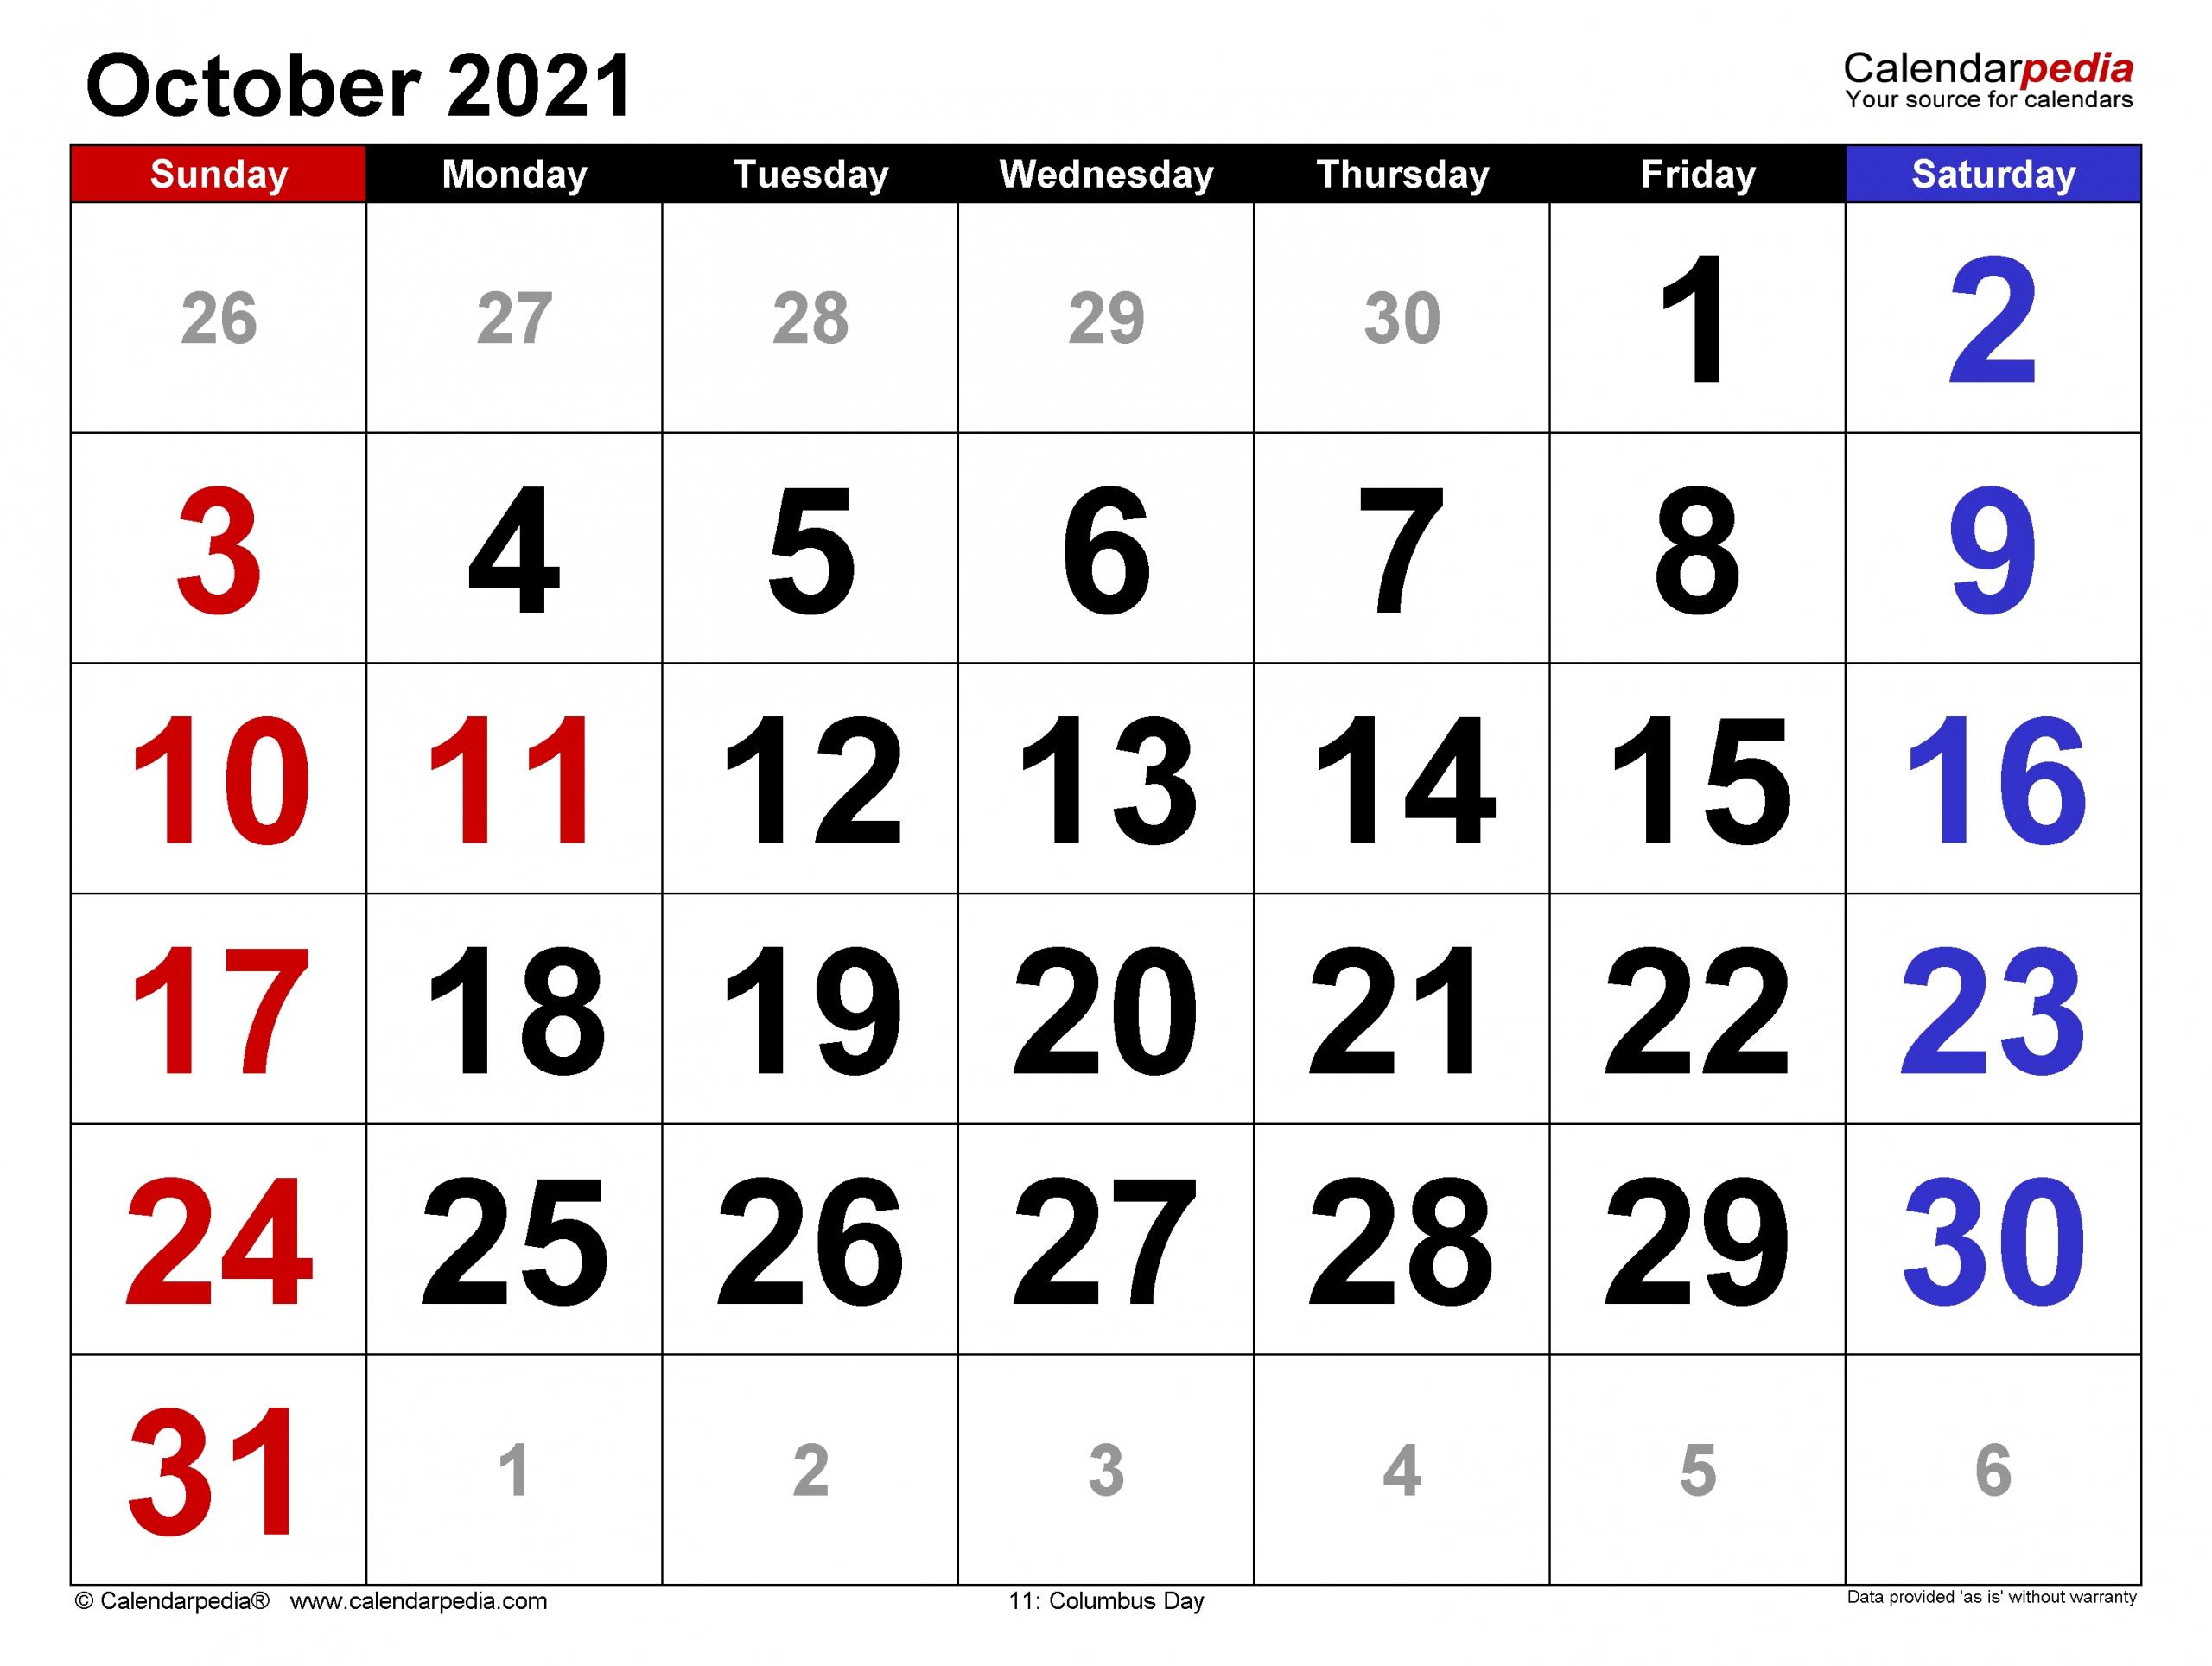 October Calendar 2021 | Month Calendar Printable intended for 2021 Writable Calendars By Month